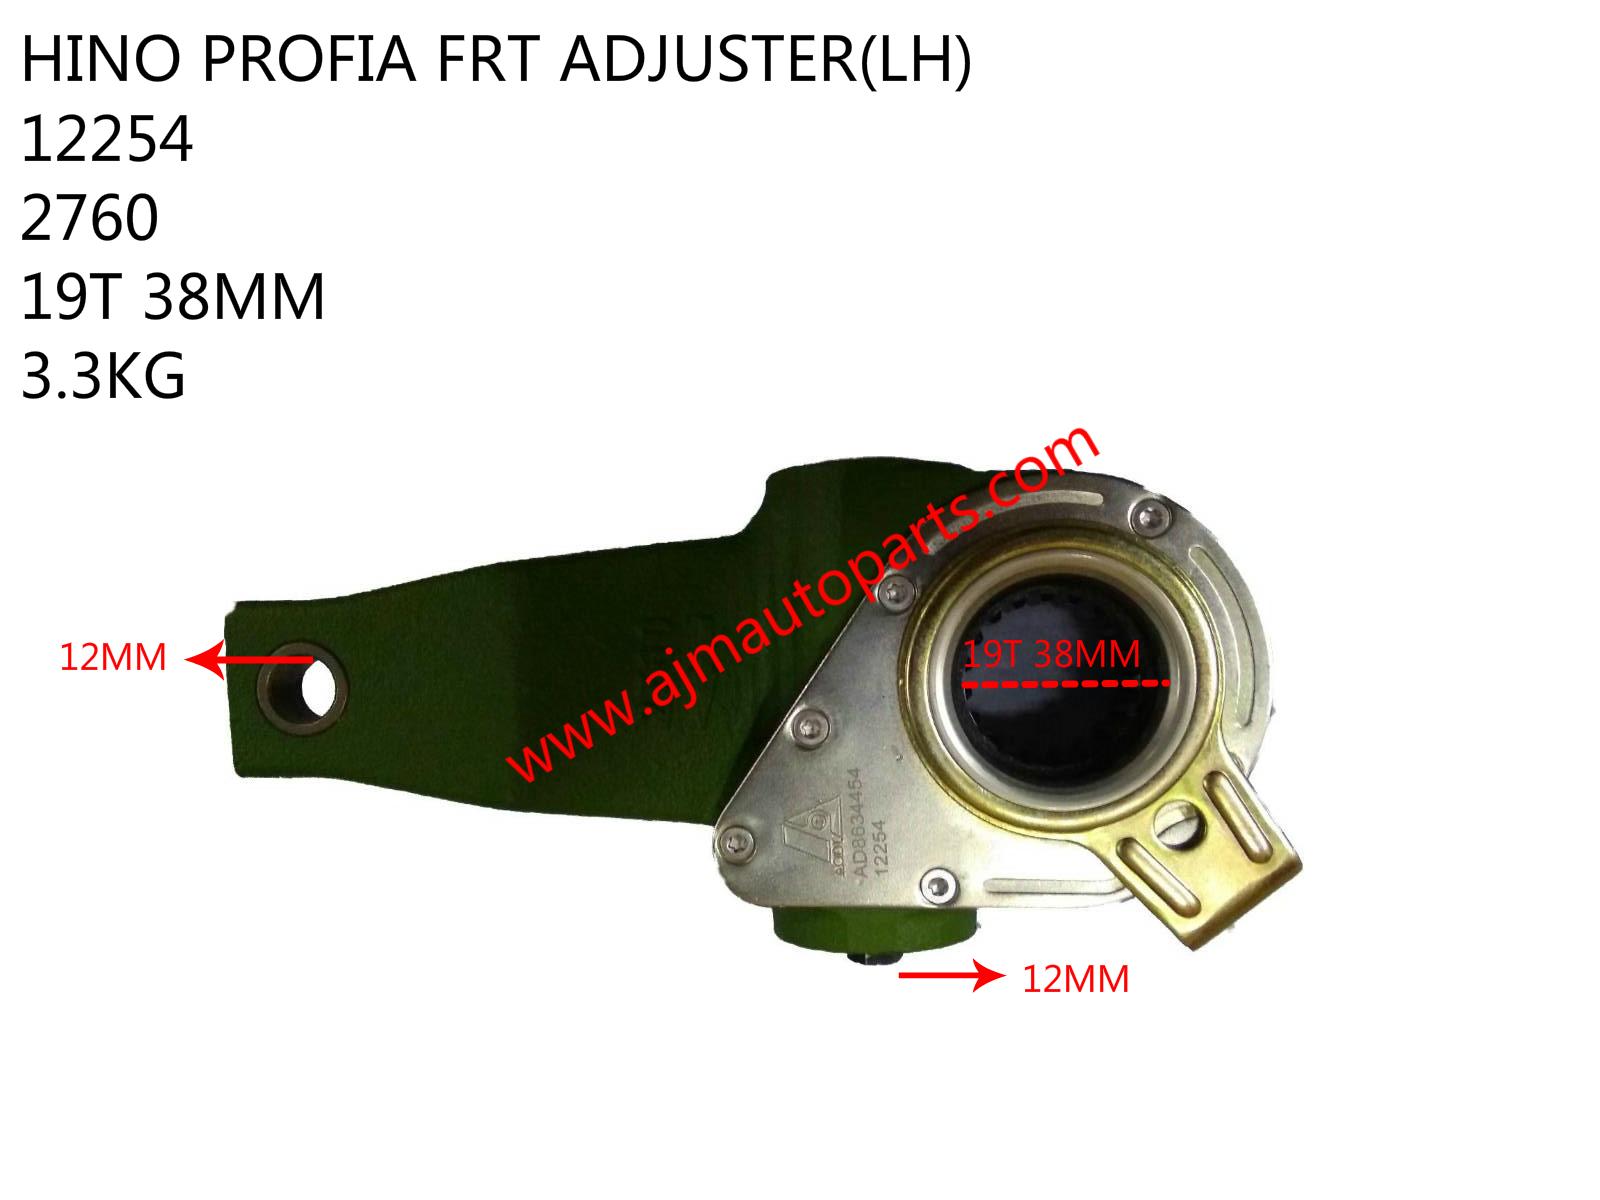 HINO PROFIA FRT ADJUSTER(LH)-12254-2760